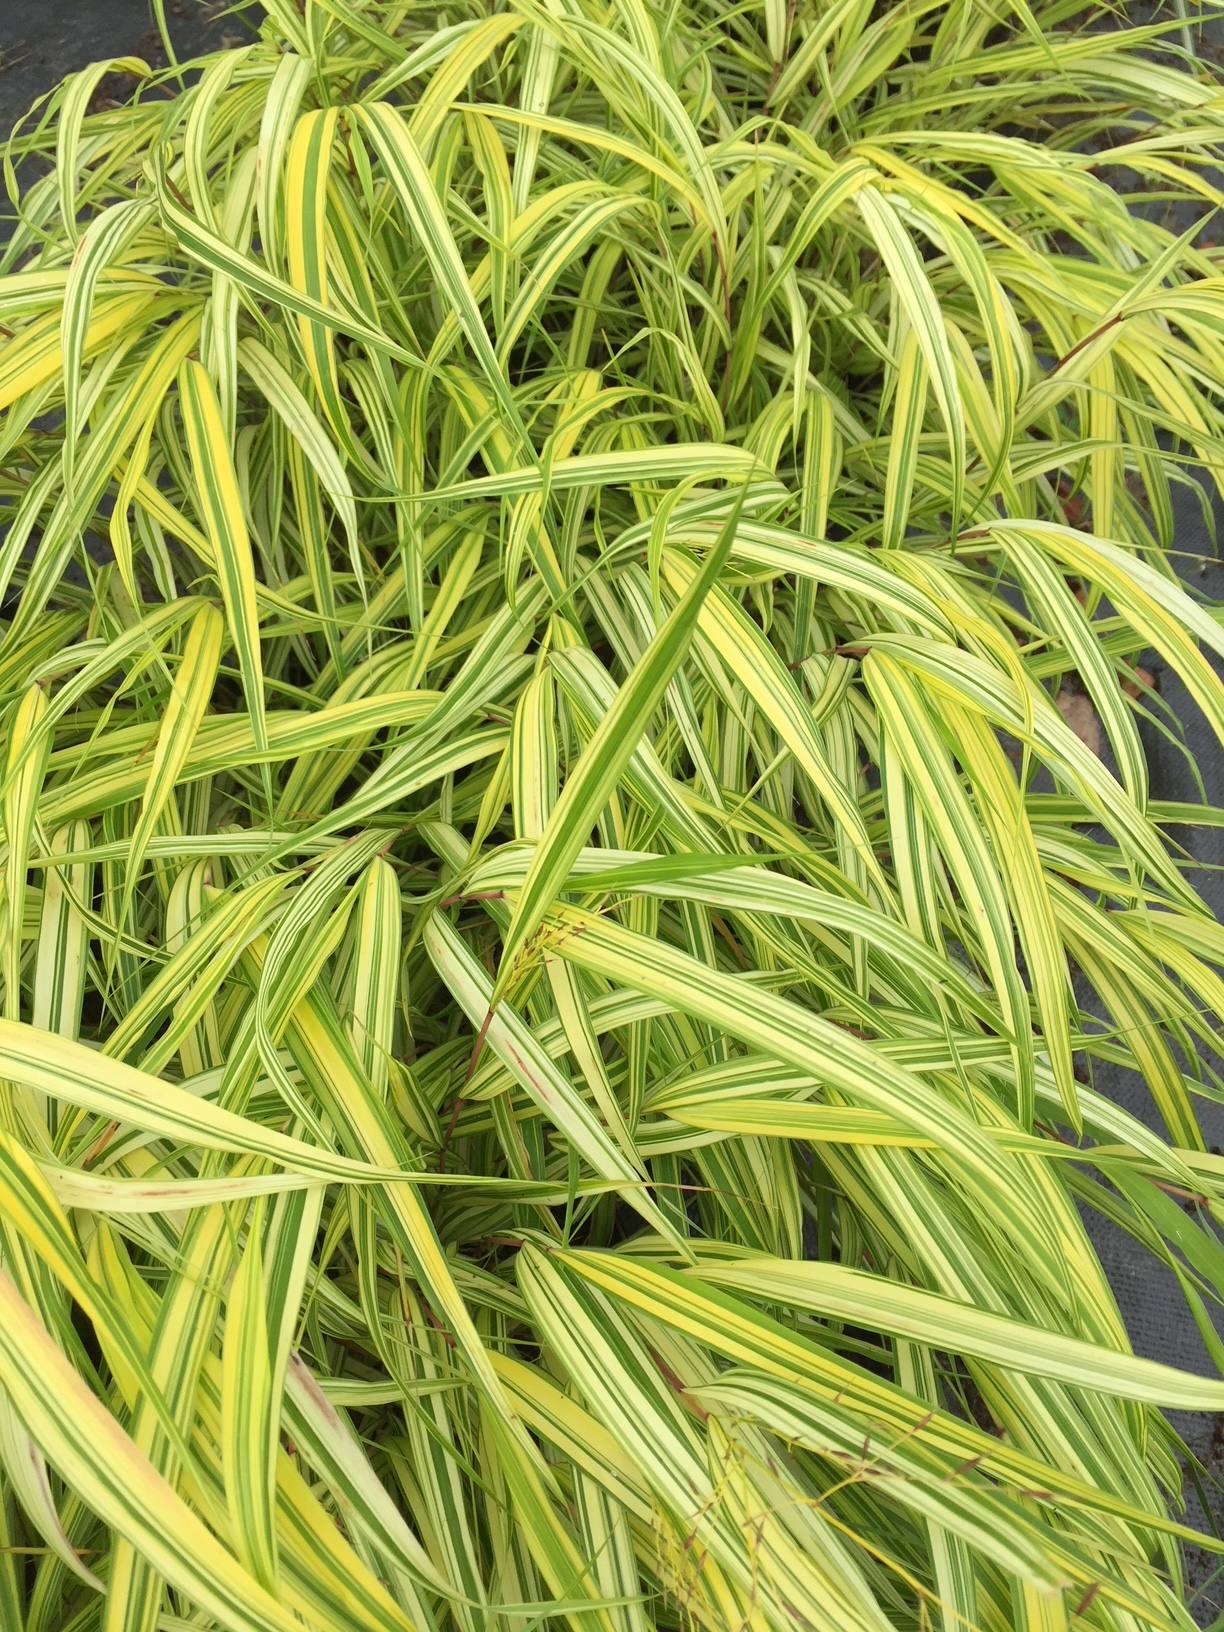 Penlan Perennials Nursery: Hakonechloa Macra 'Naomi'